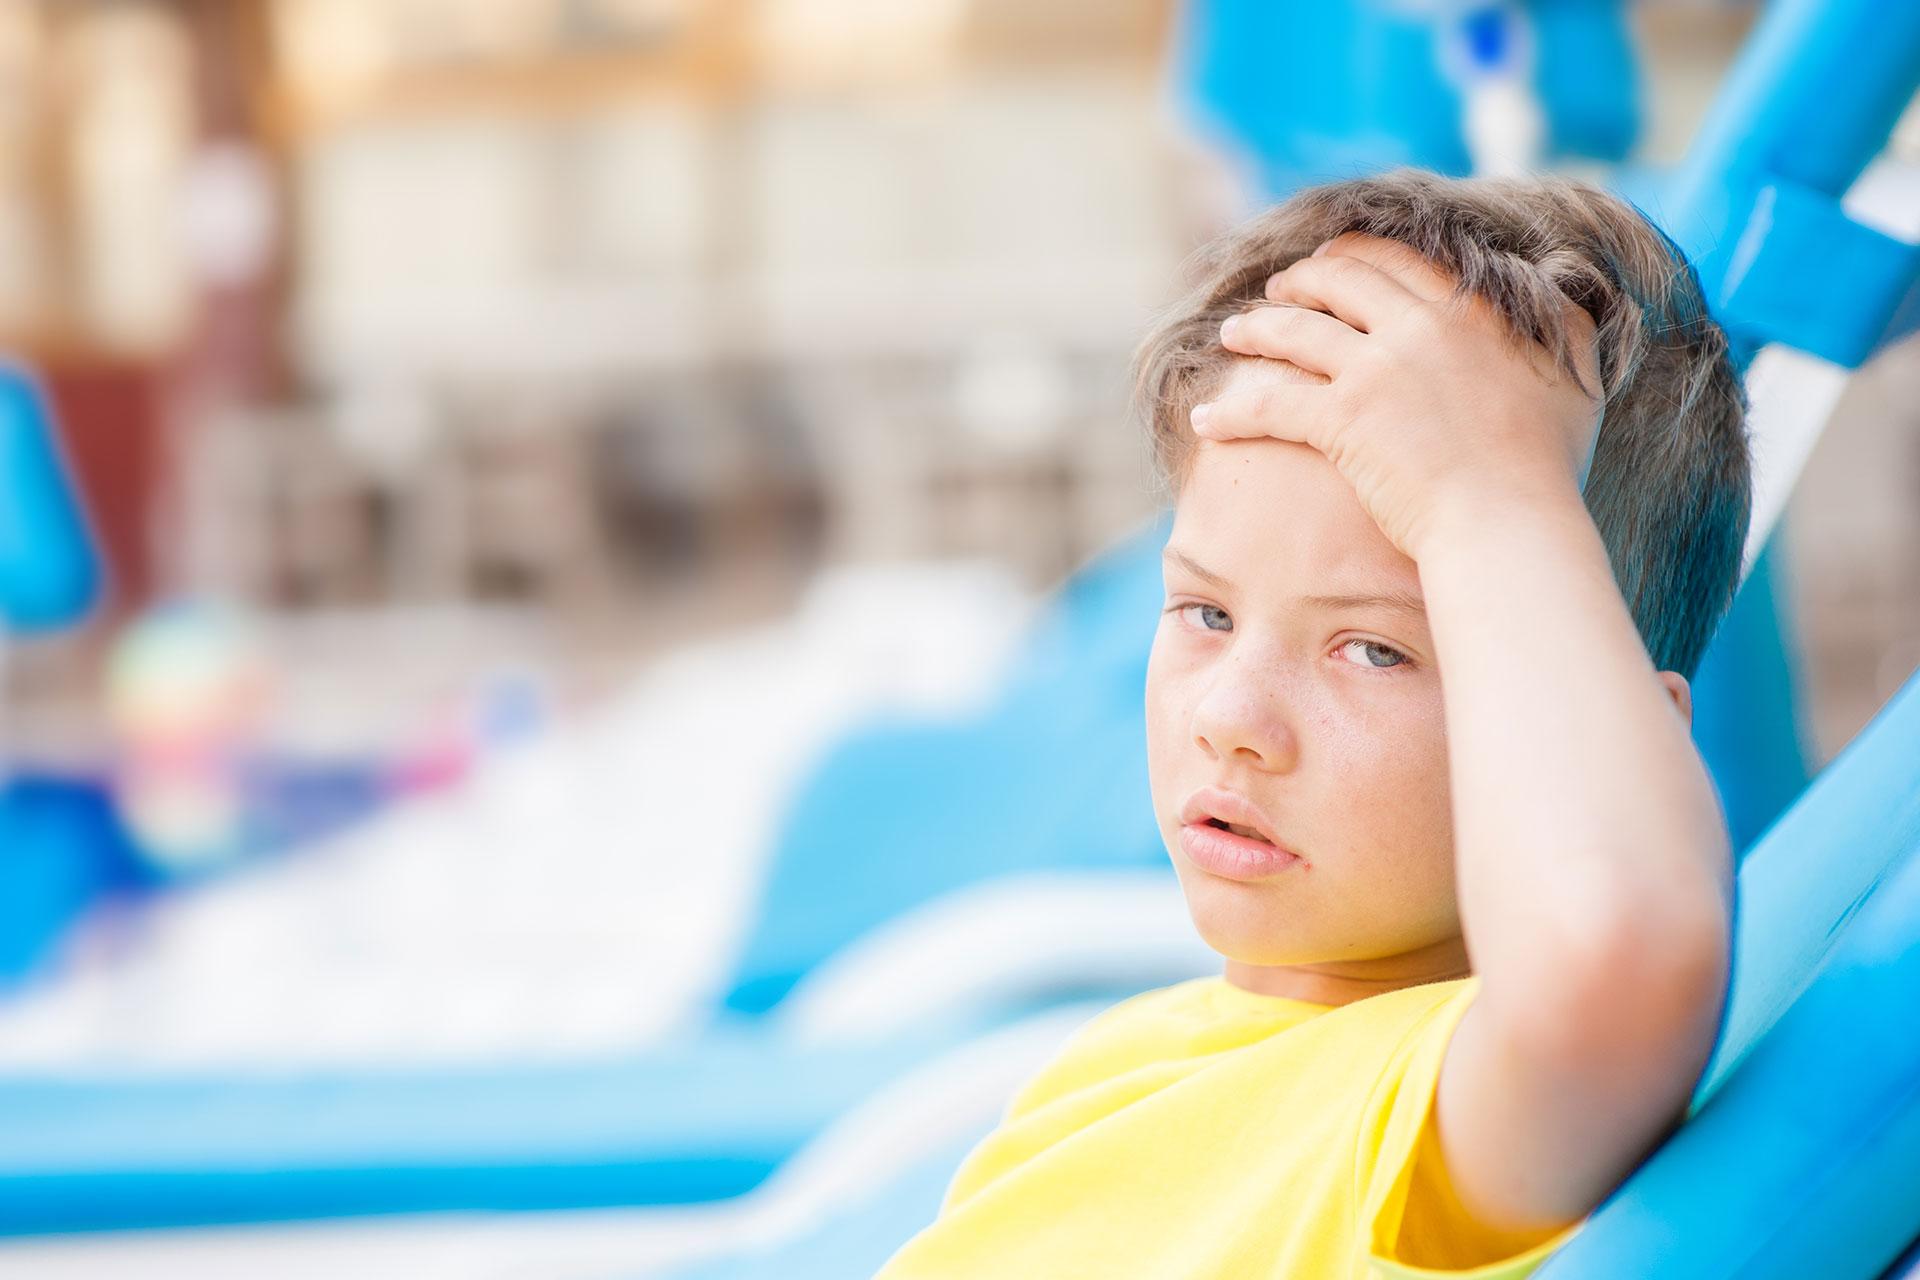 Stressed Kid; Courtesy of Ermolaev Alexander/Shutterstock.com